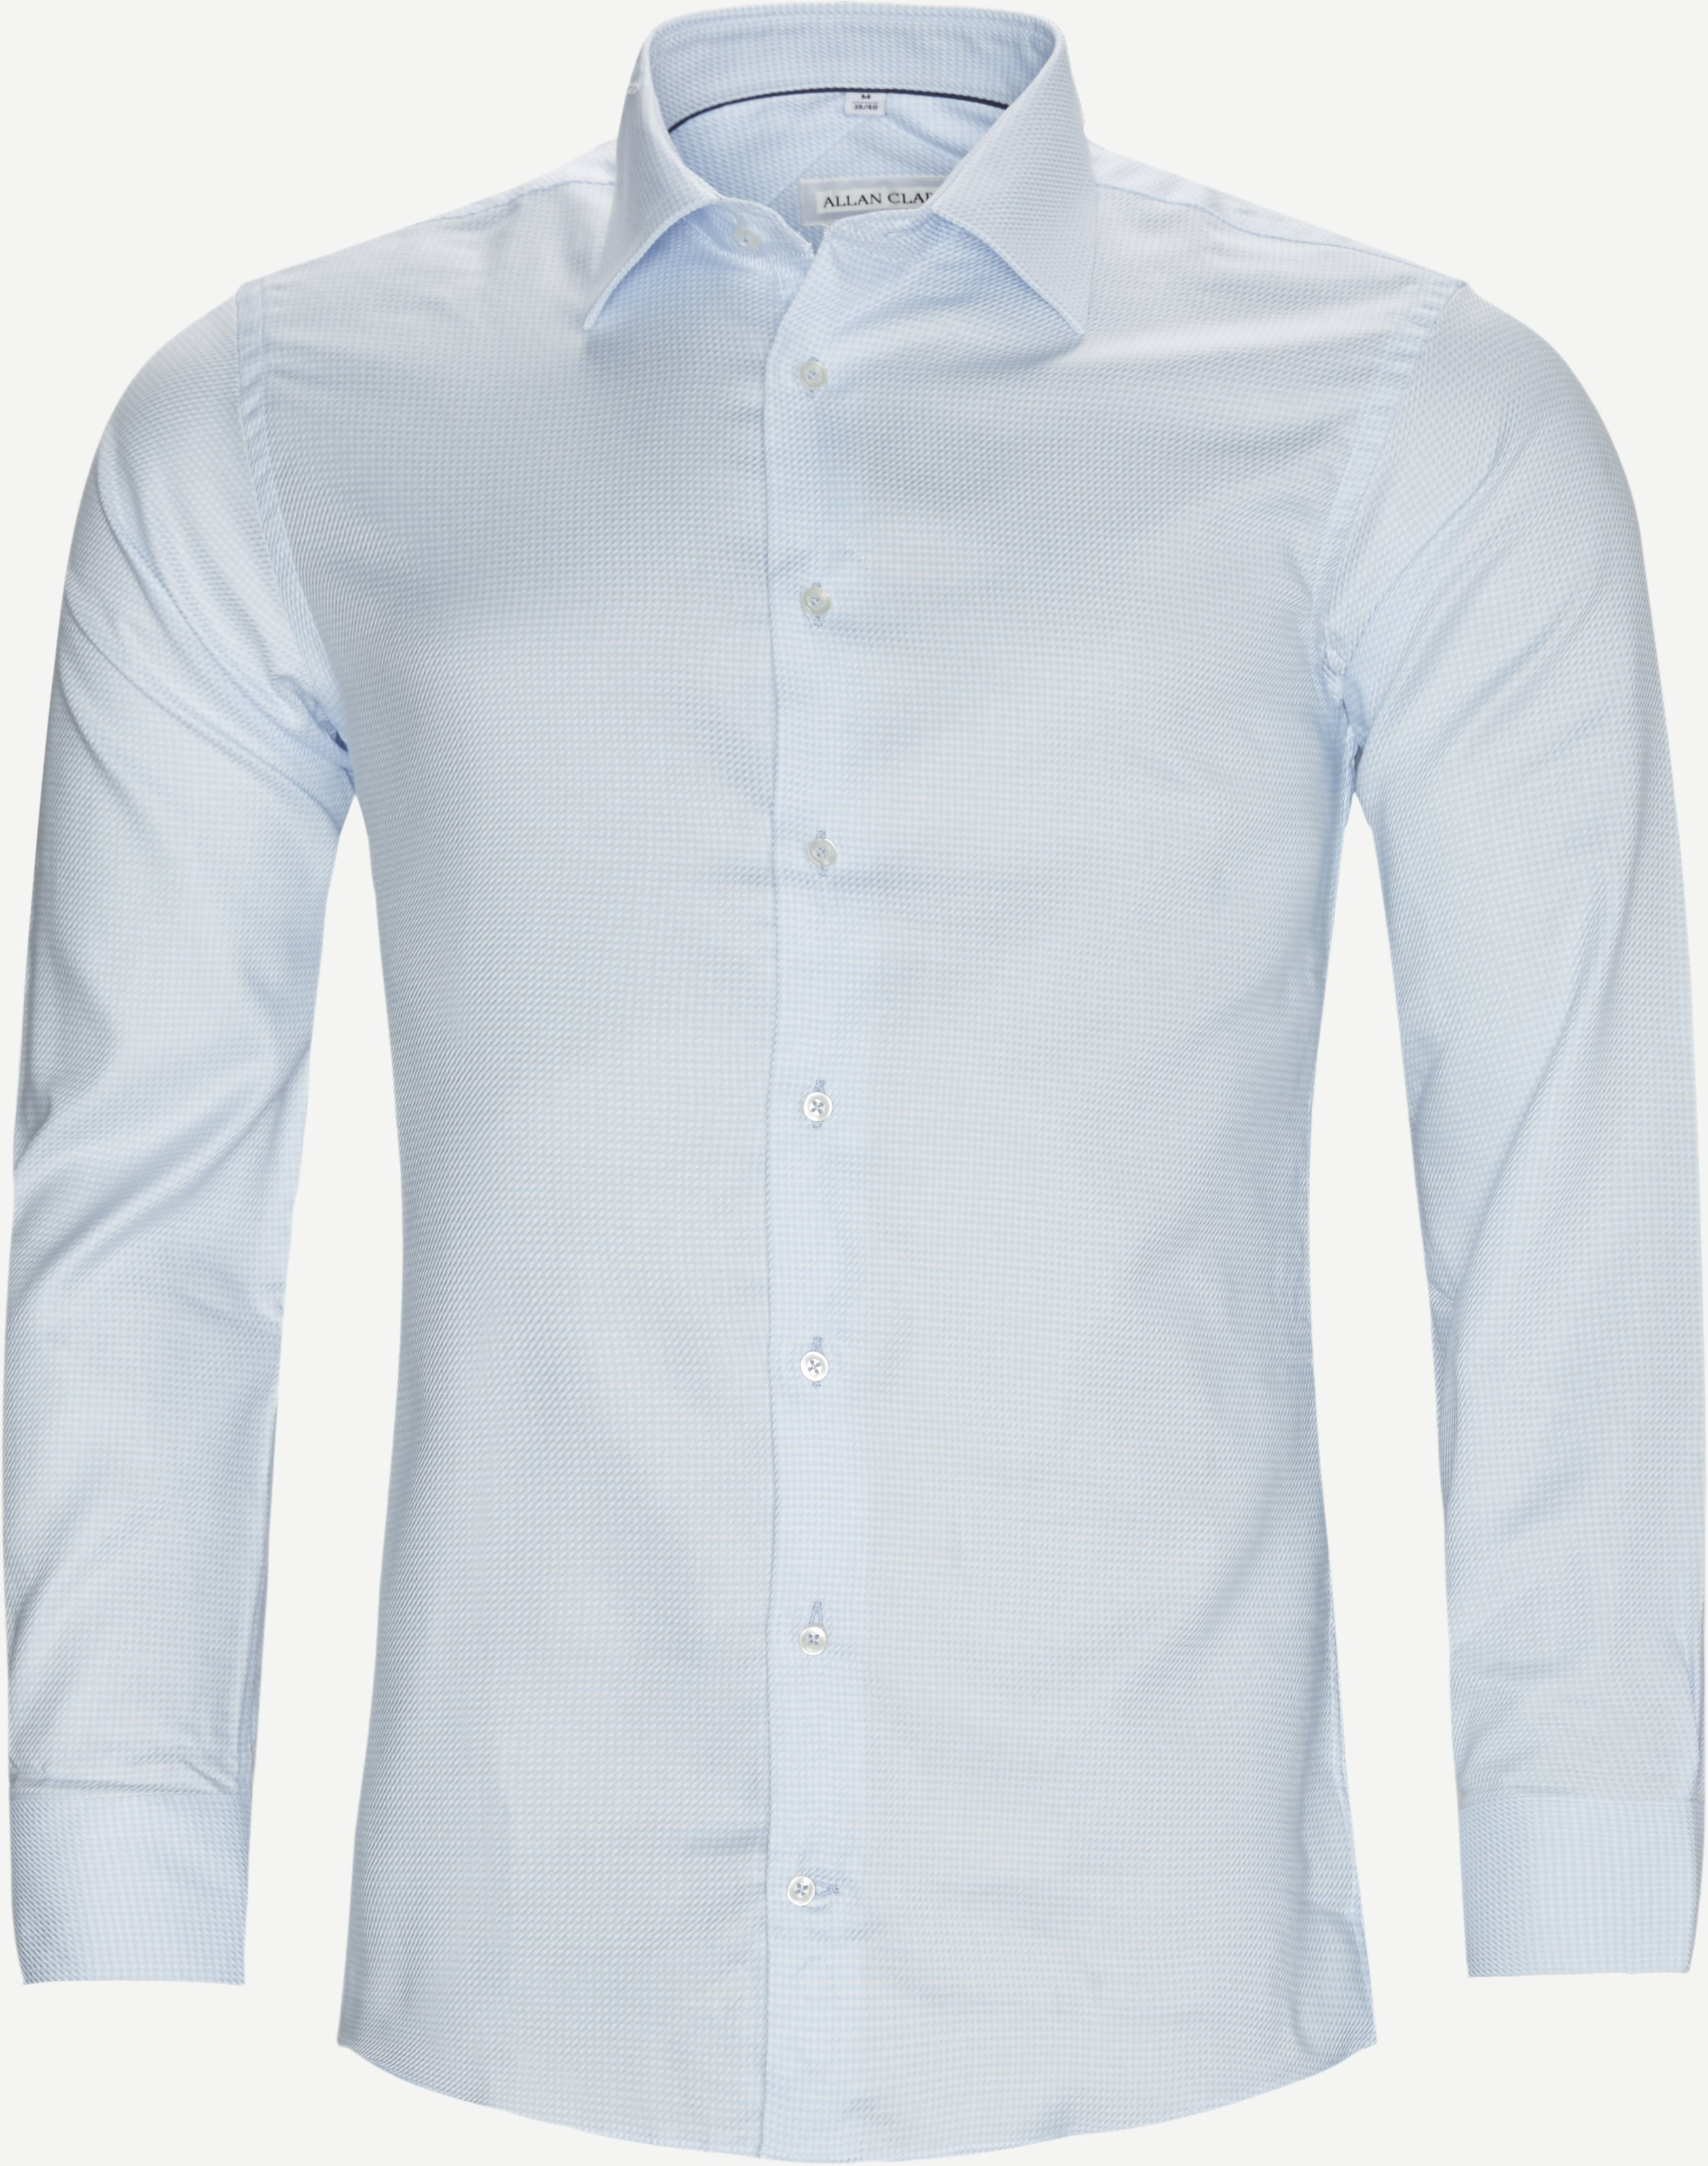 Mens Elias Shirt - Shirts - Blue